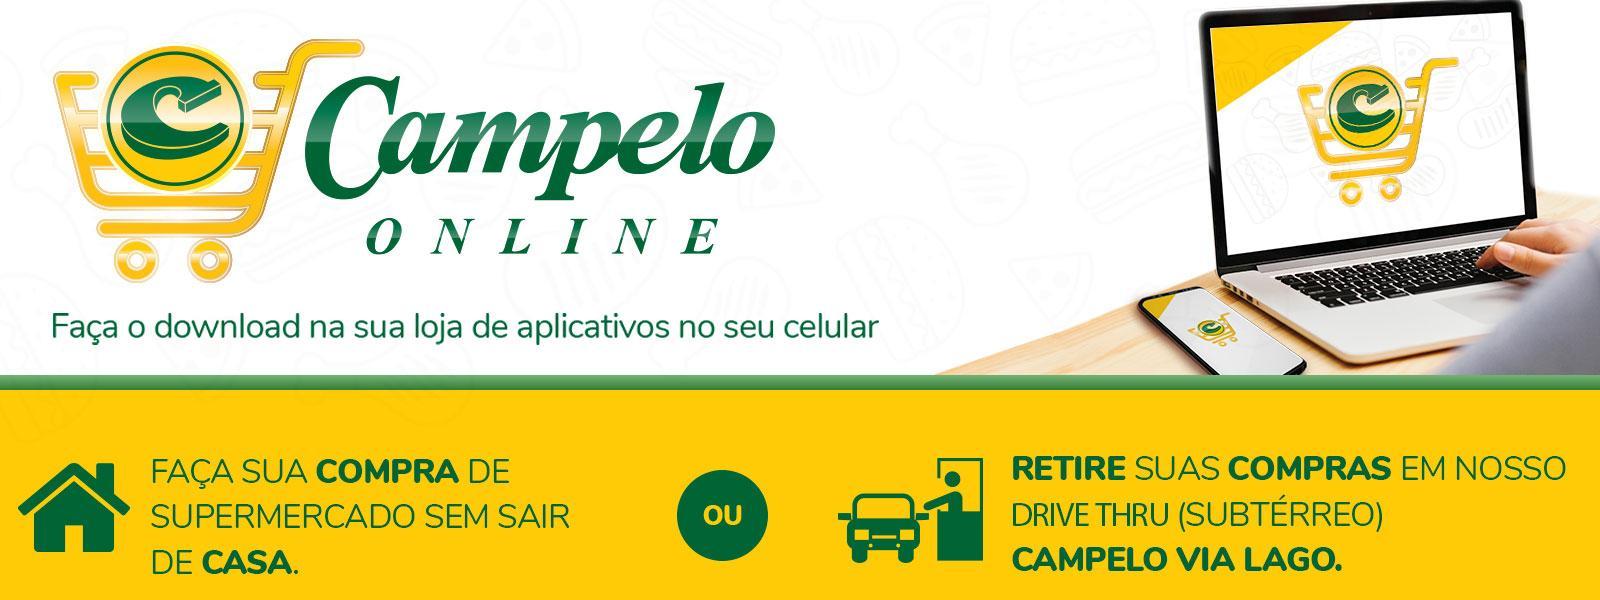 Campelo Online